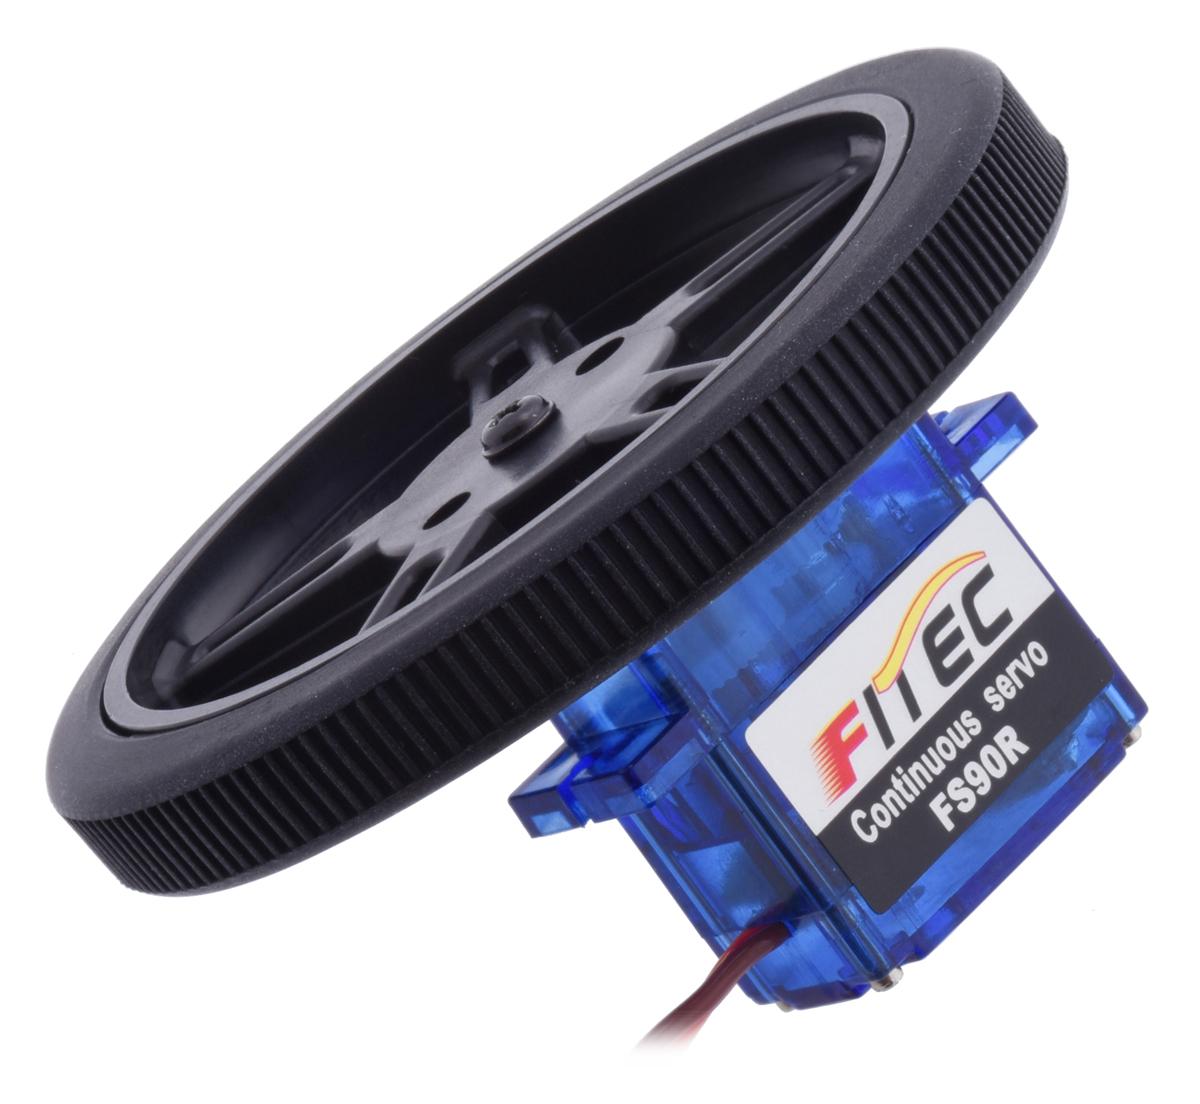 Pololu Feetech Fs90r Micro Continuous Rotation Servo Controlled Potentiometer Motor Control Wheels